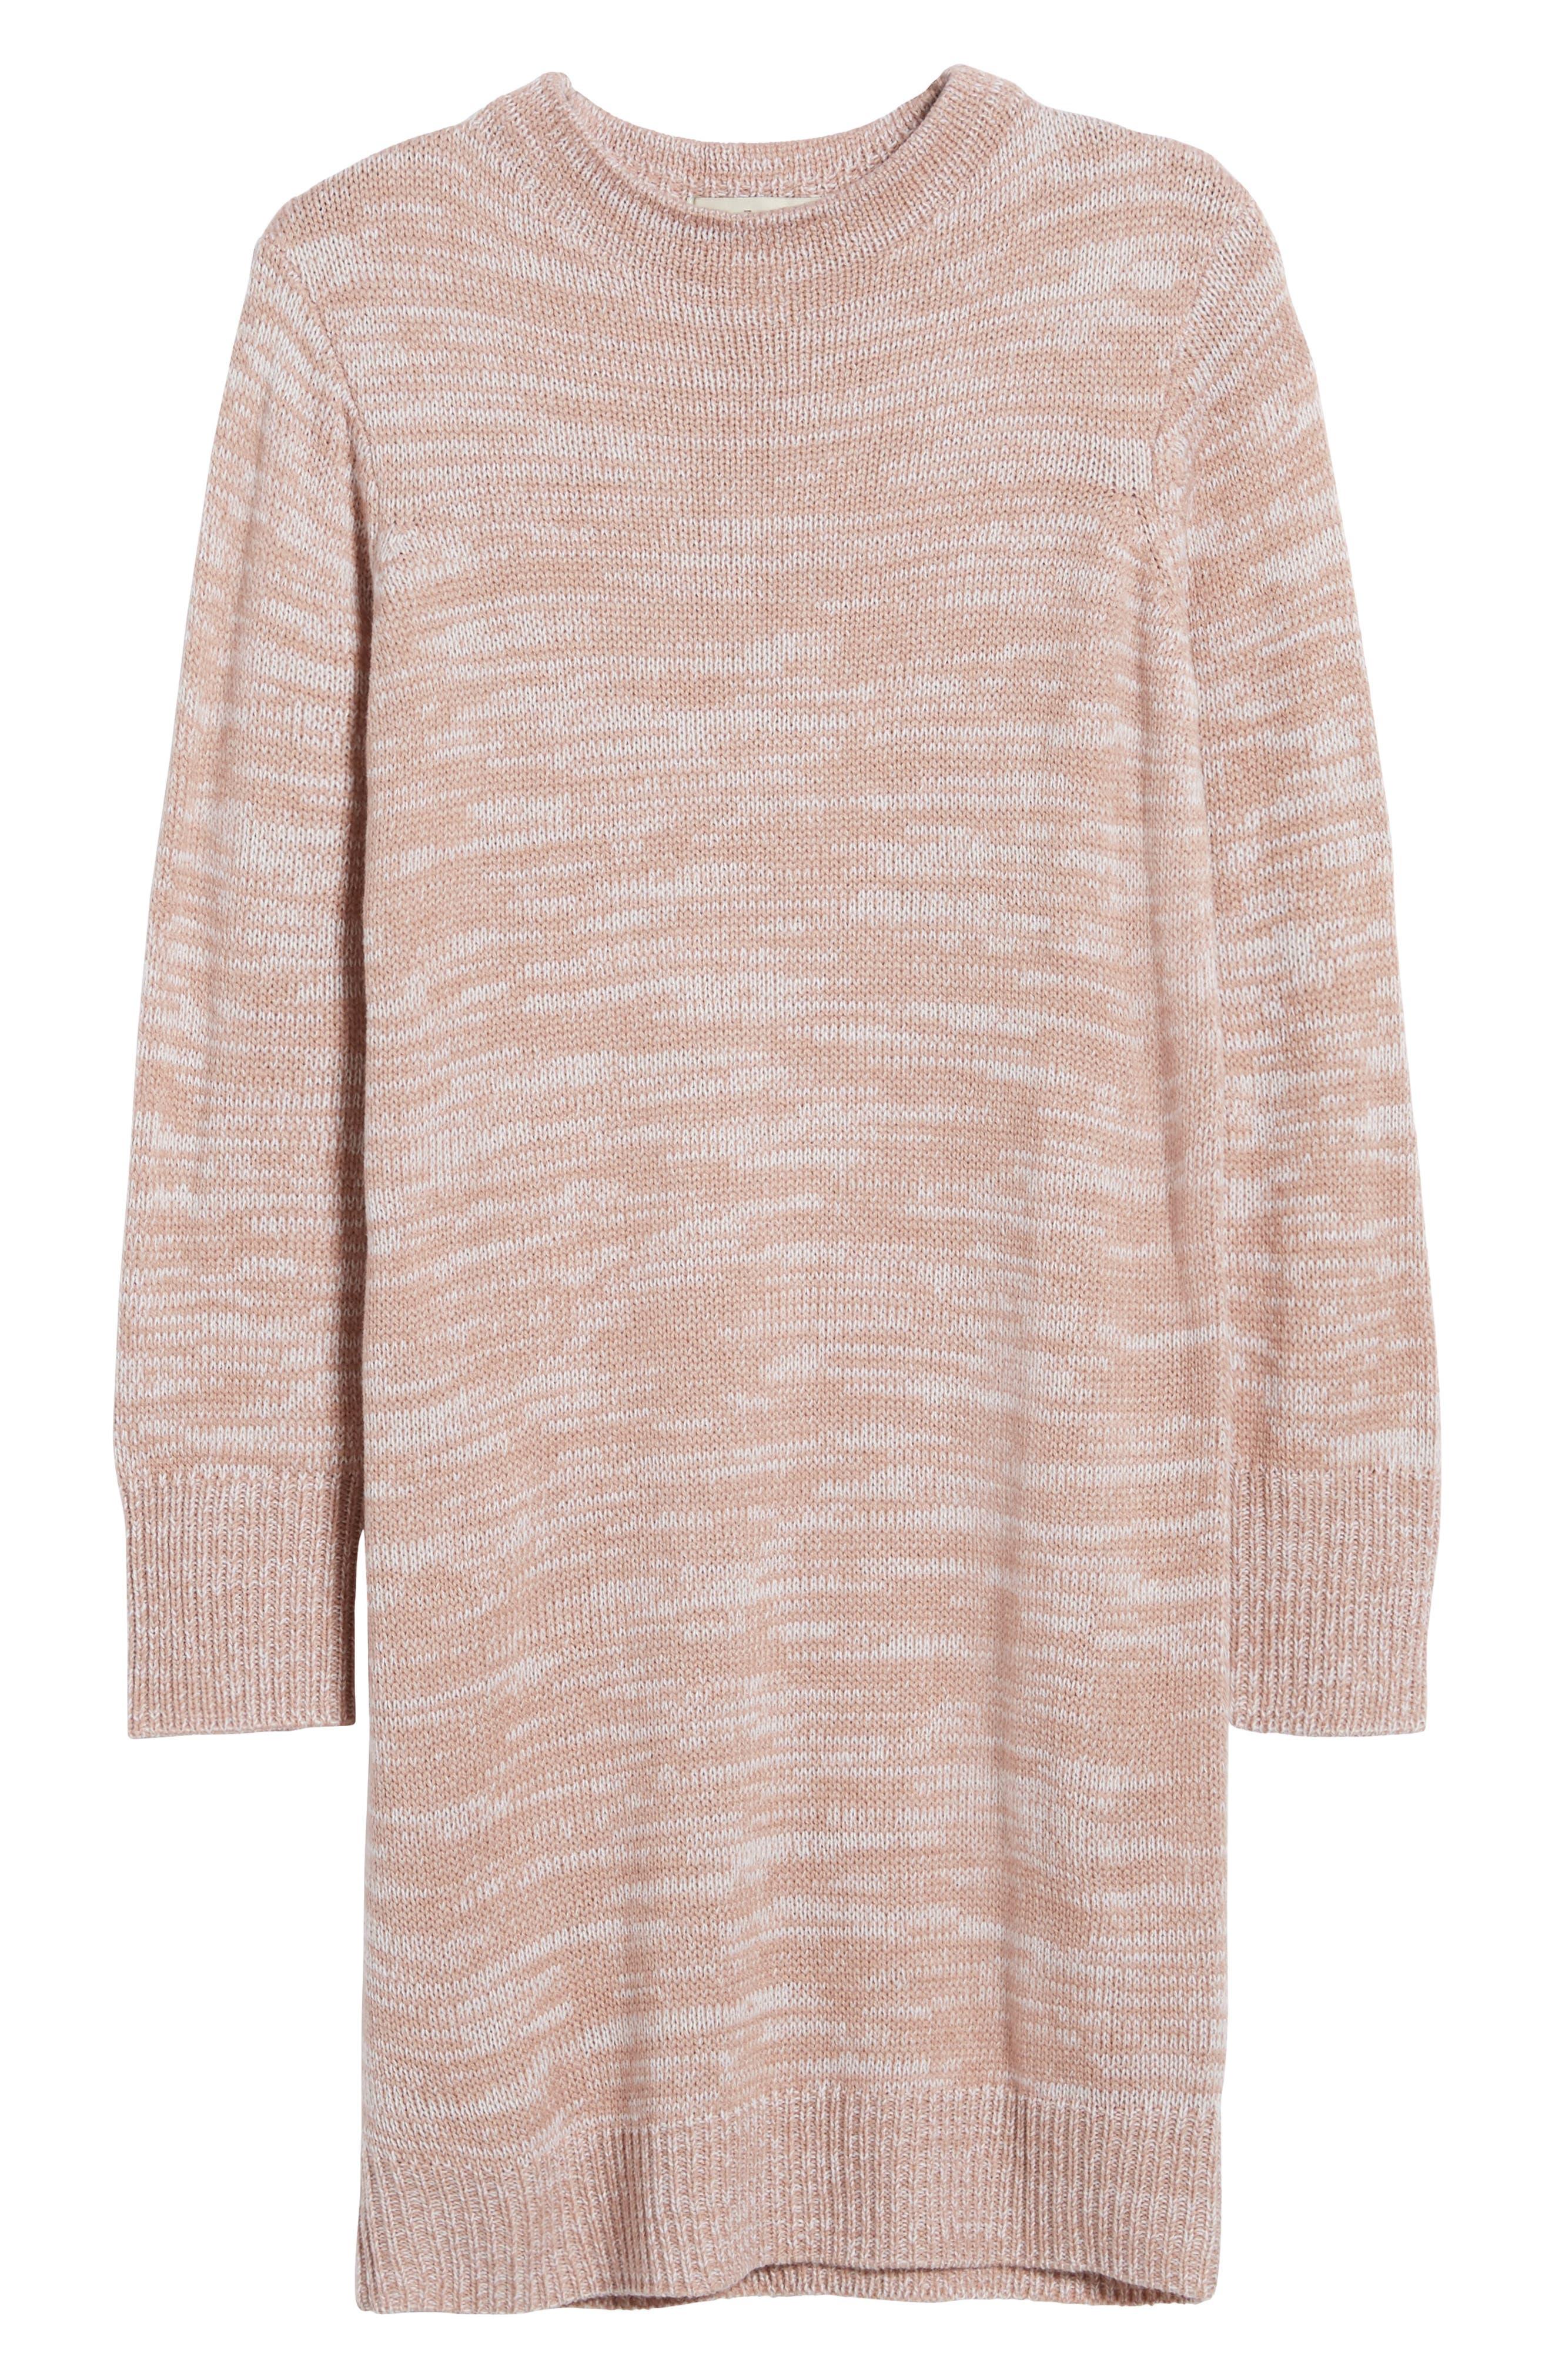 Mock Neck Sweater,                             Alternate thumbnail 6, color,                             Pink Adobe/ Ivory